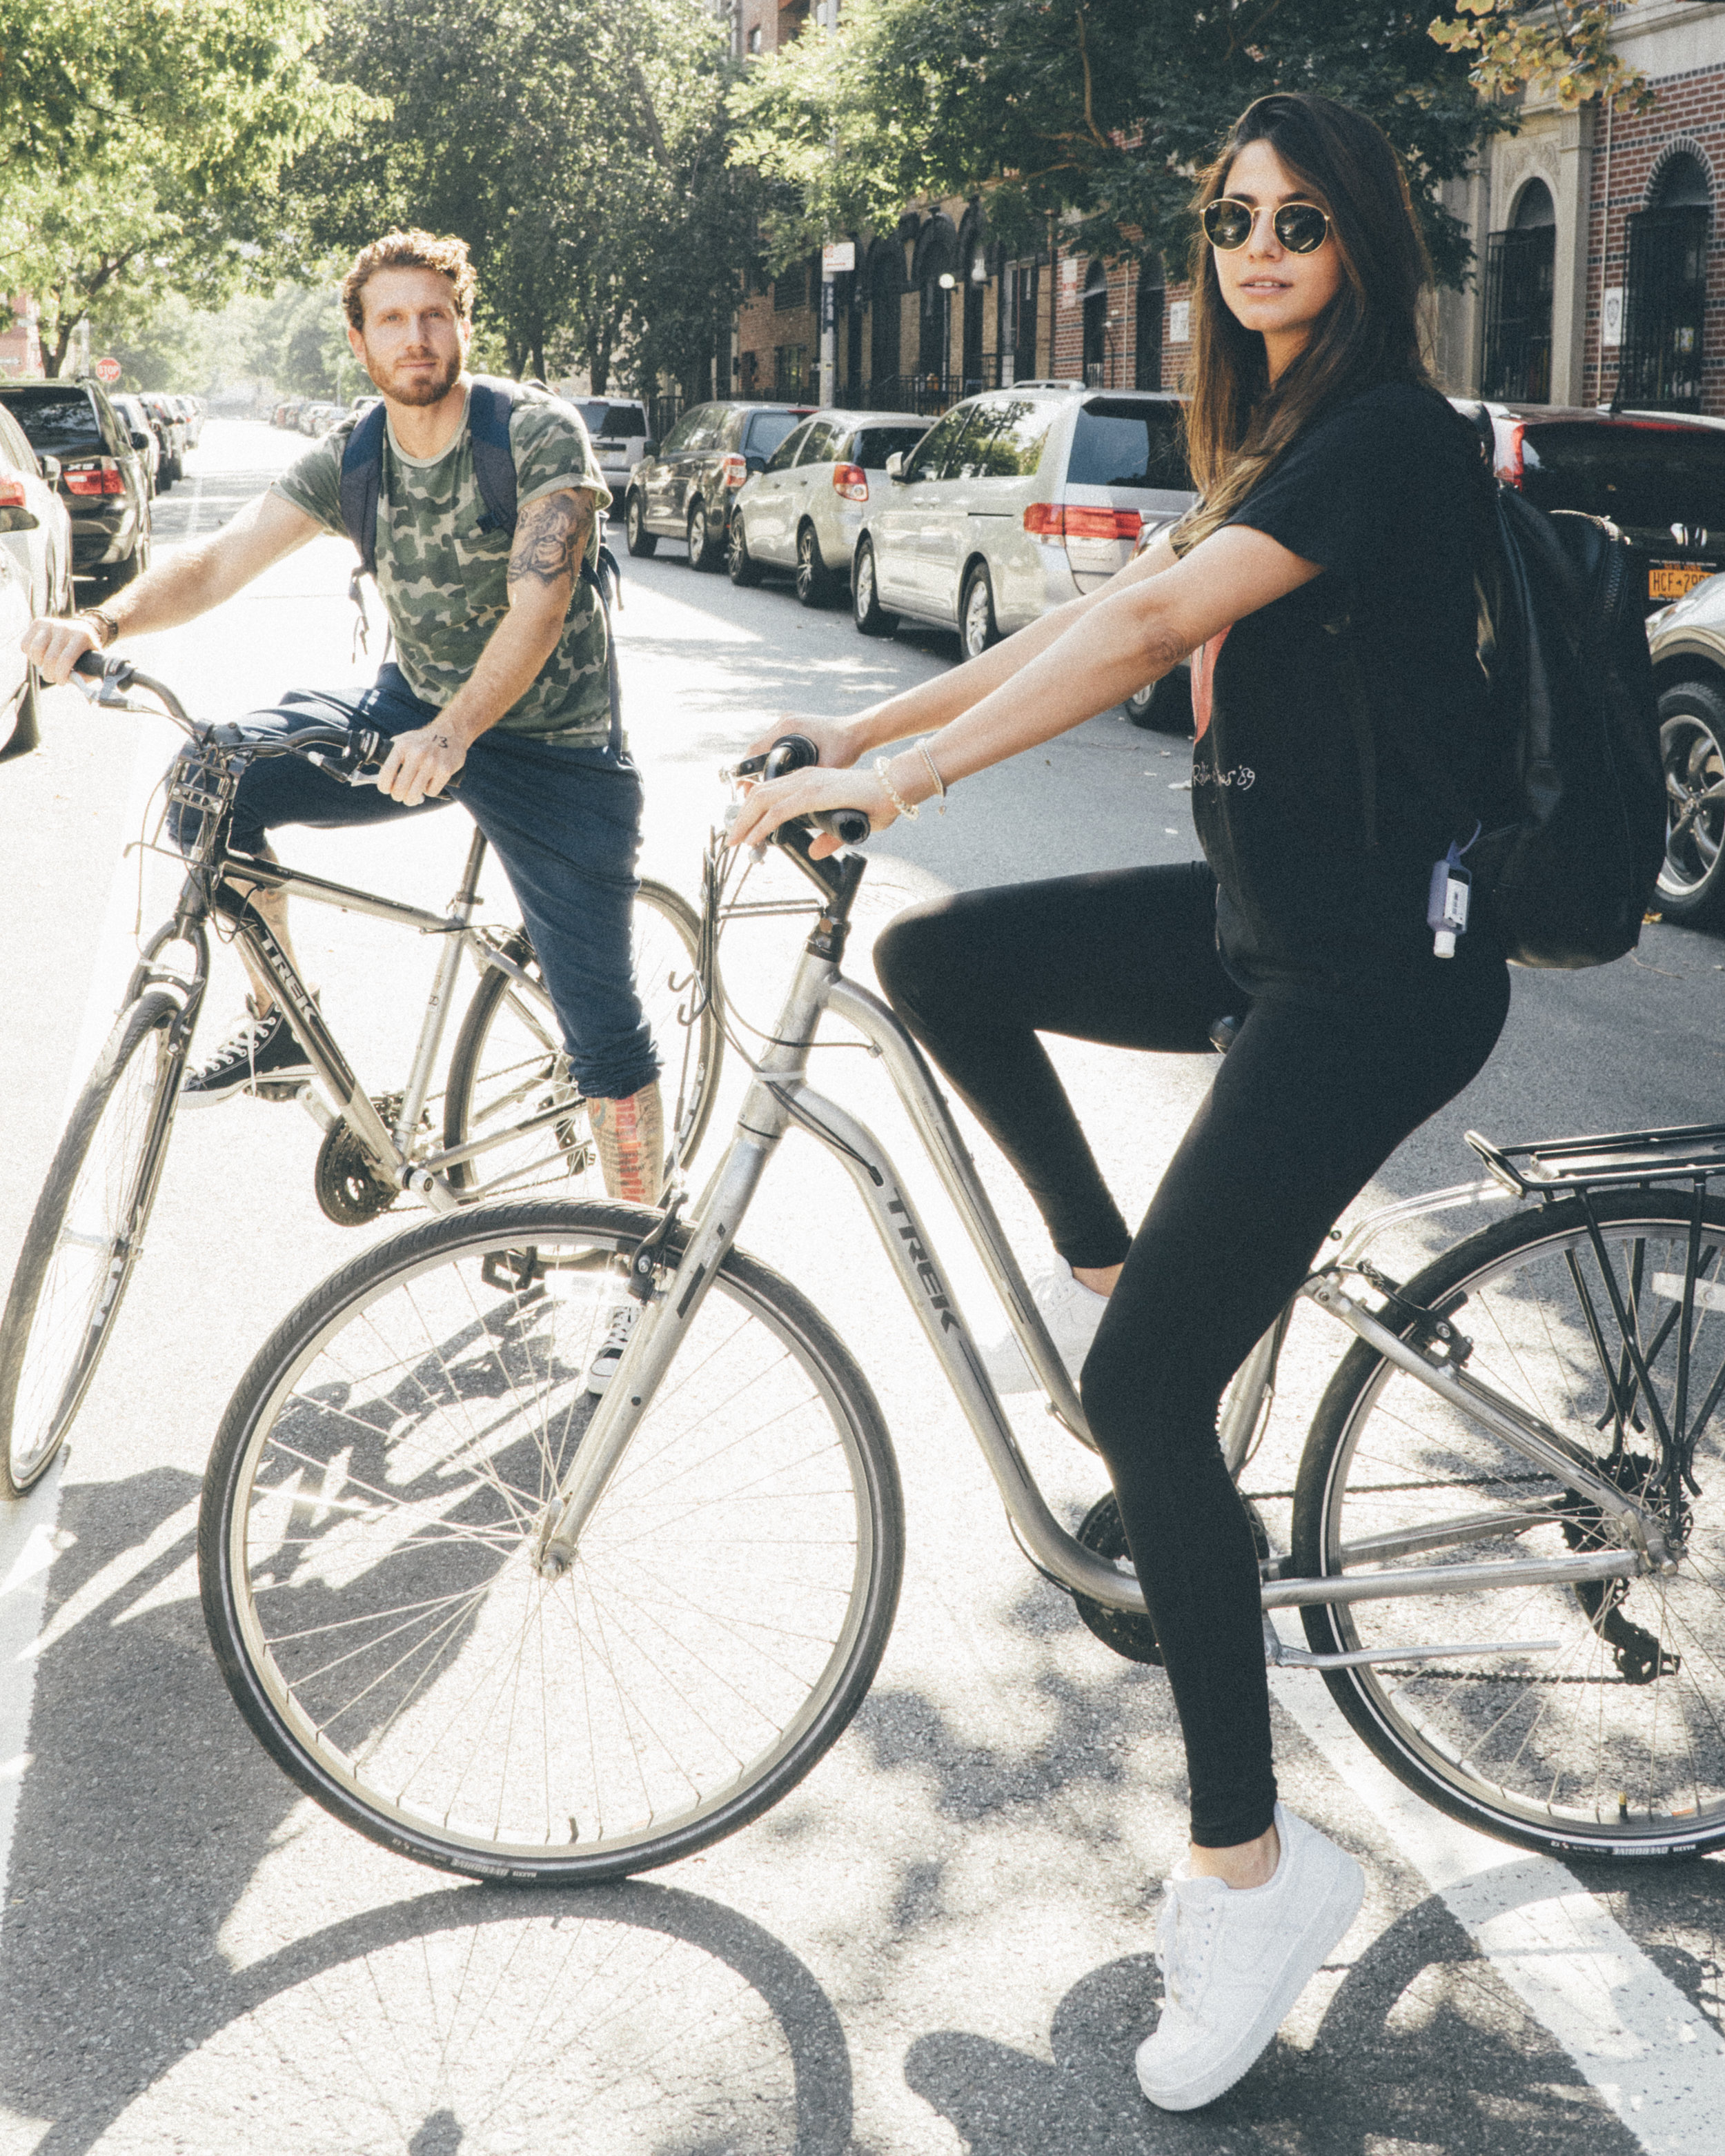 Bikes & Brews - 1/3